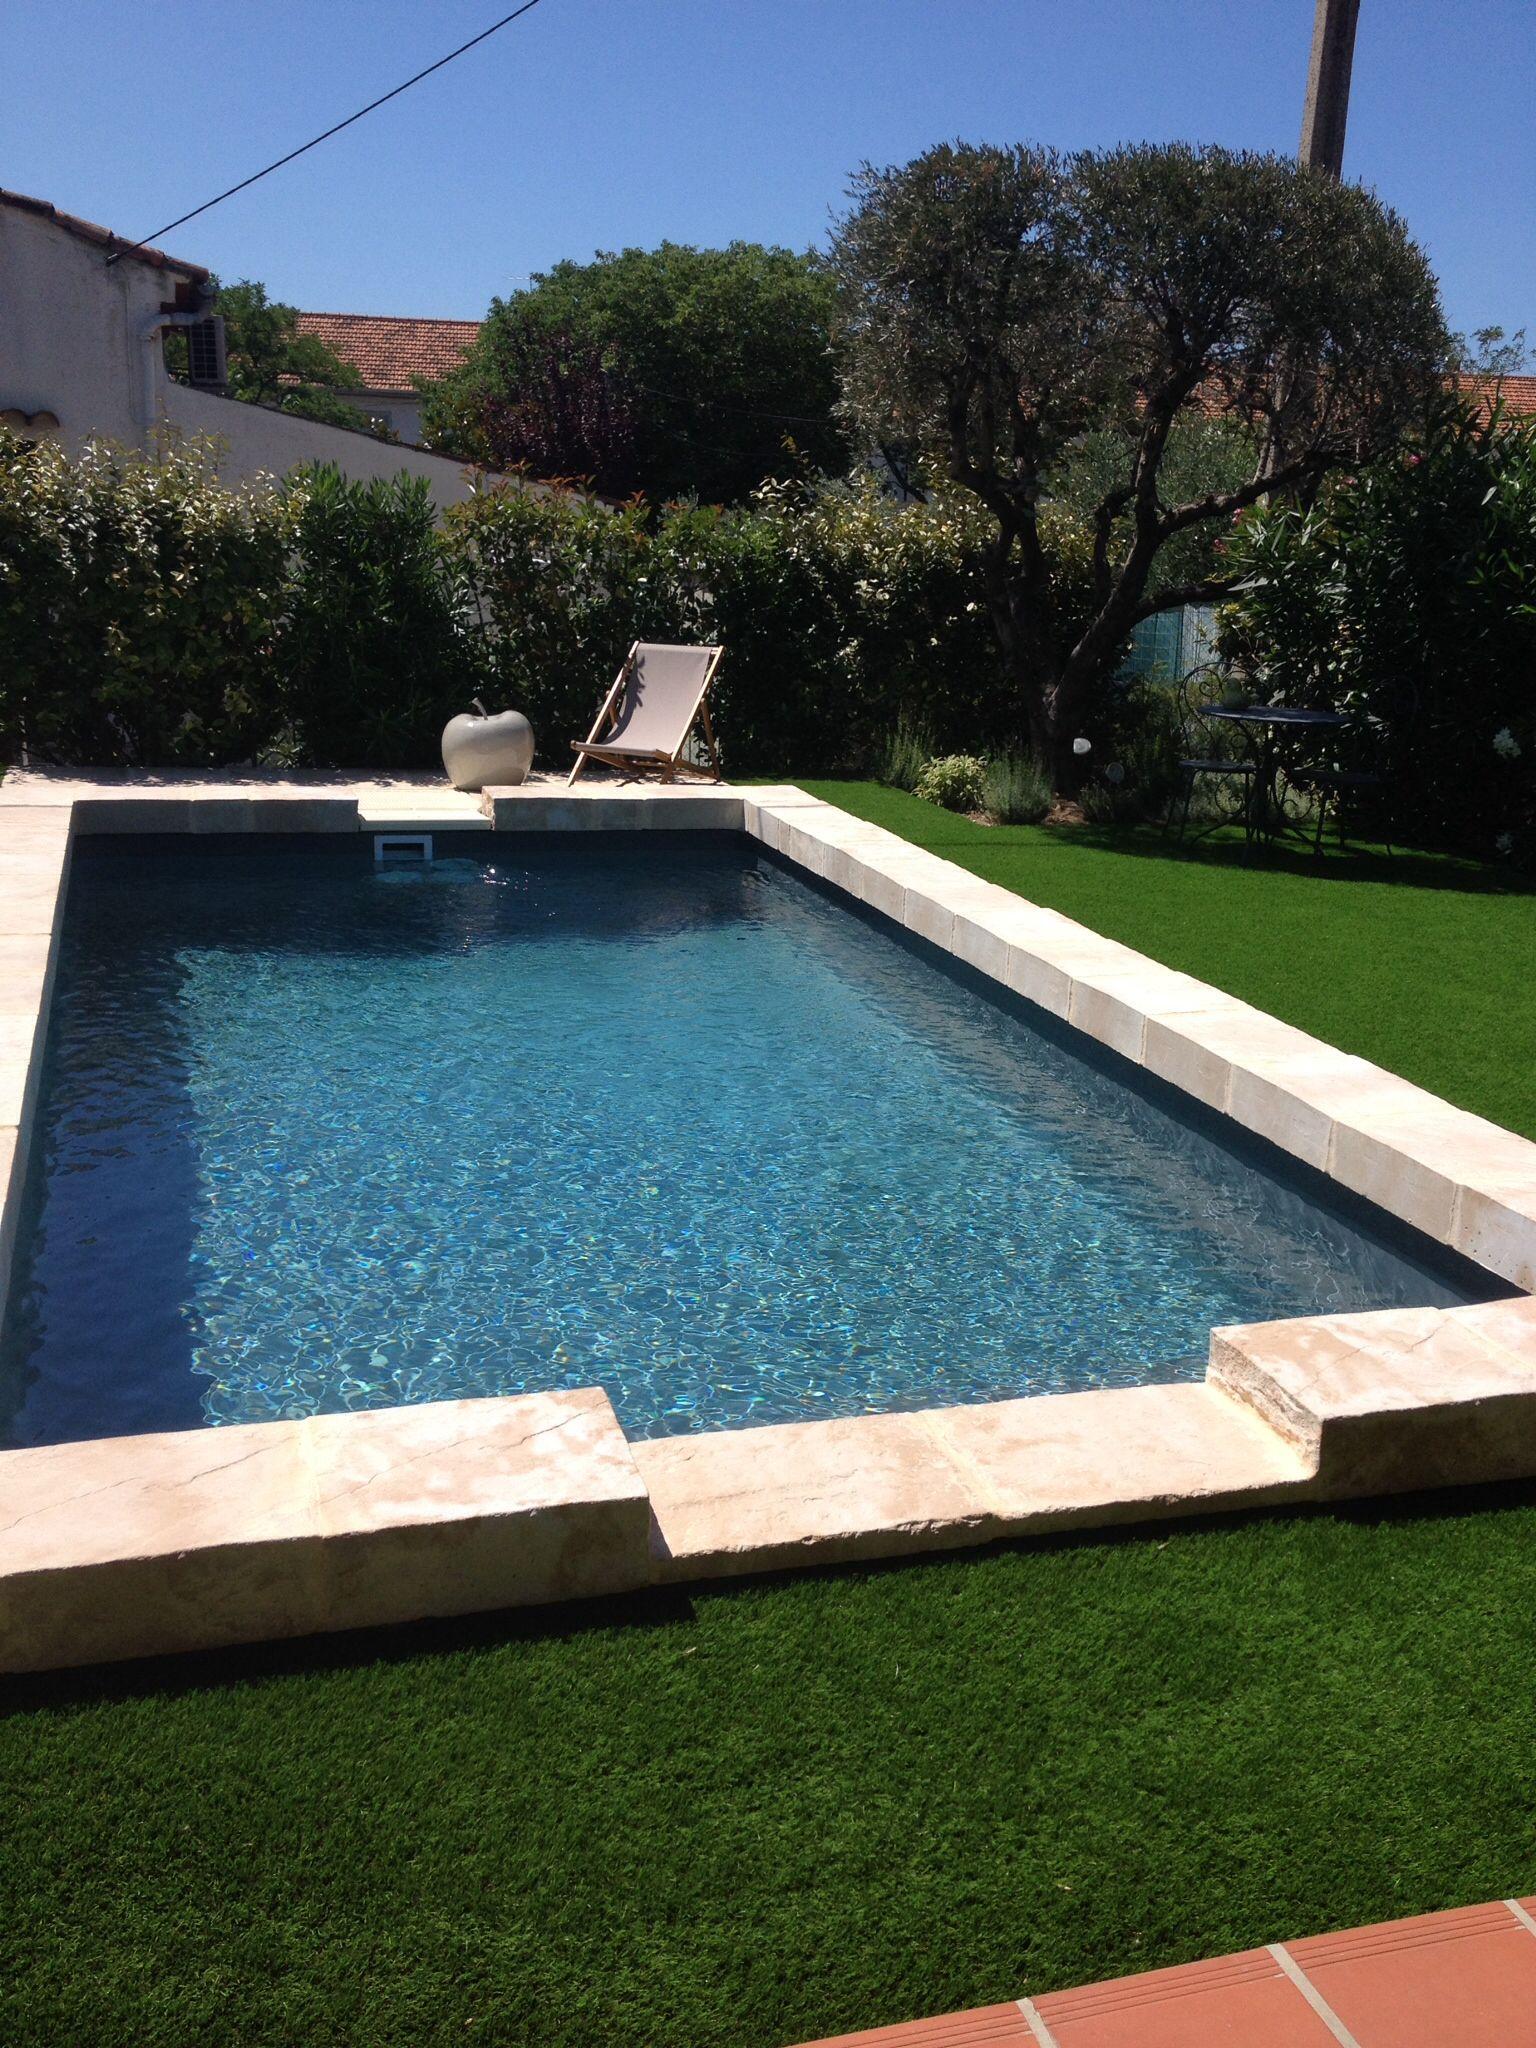 nage a contre courant desjoyaux carr bleu with nage a contre courant desjoyaux beautiful nage. Black Bedroom Furniture Sets. Home Design Ideas